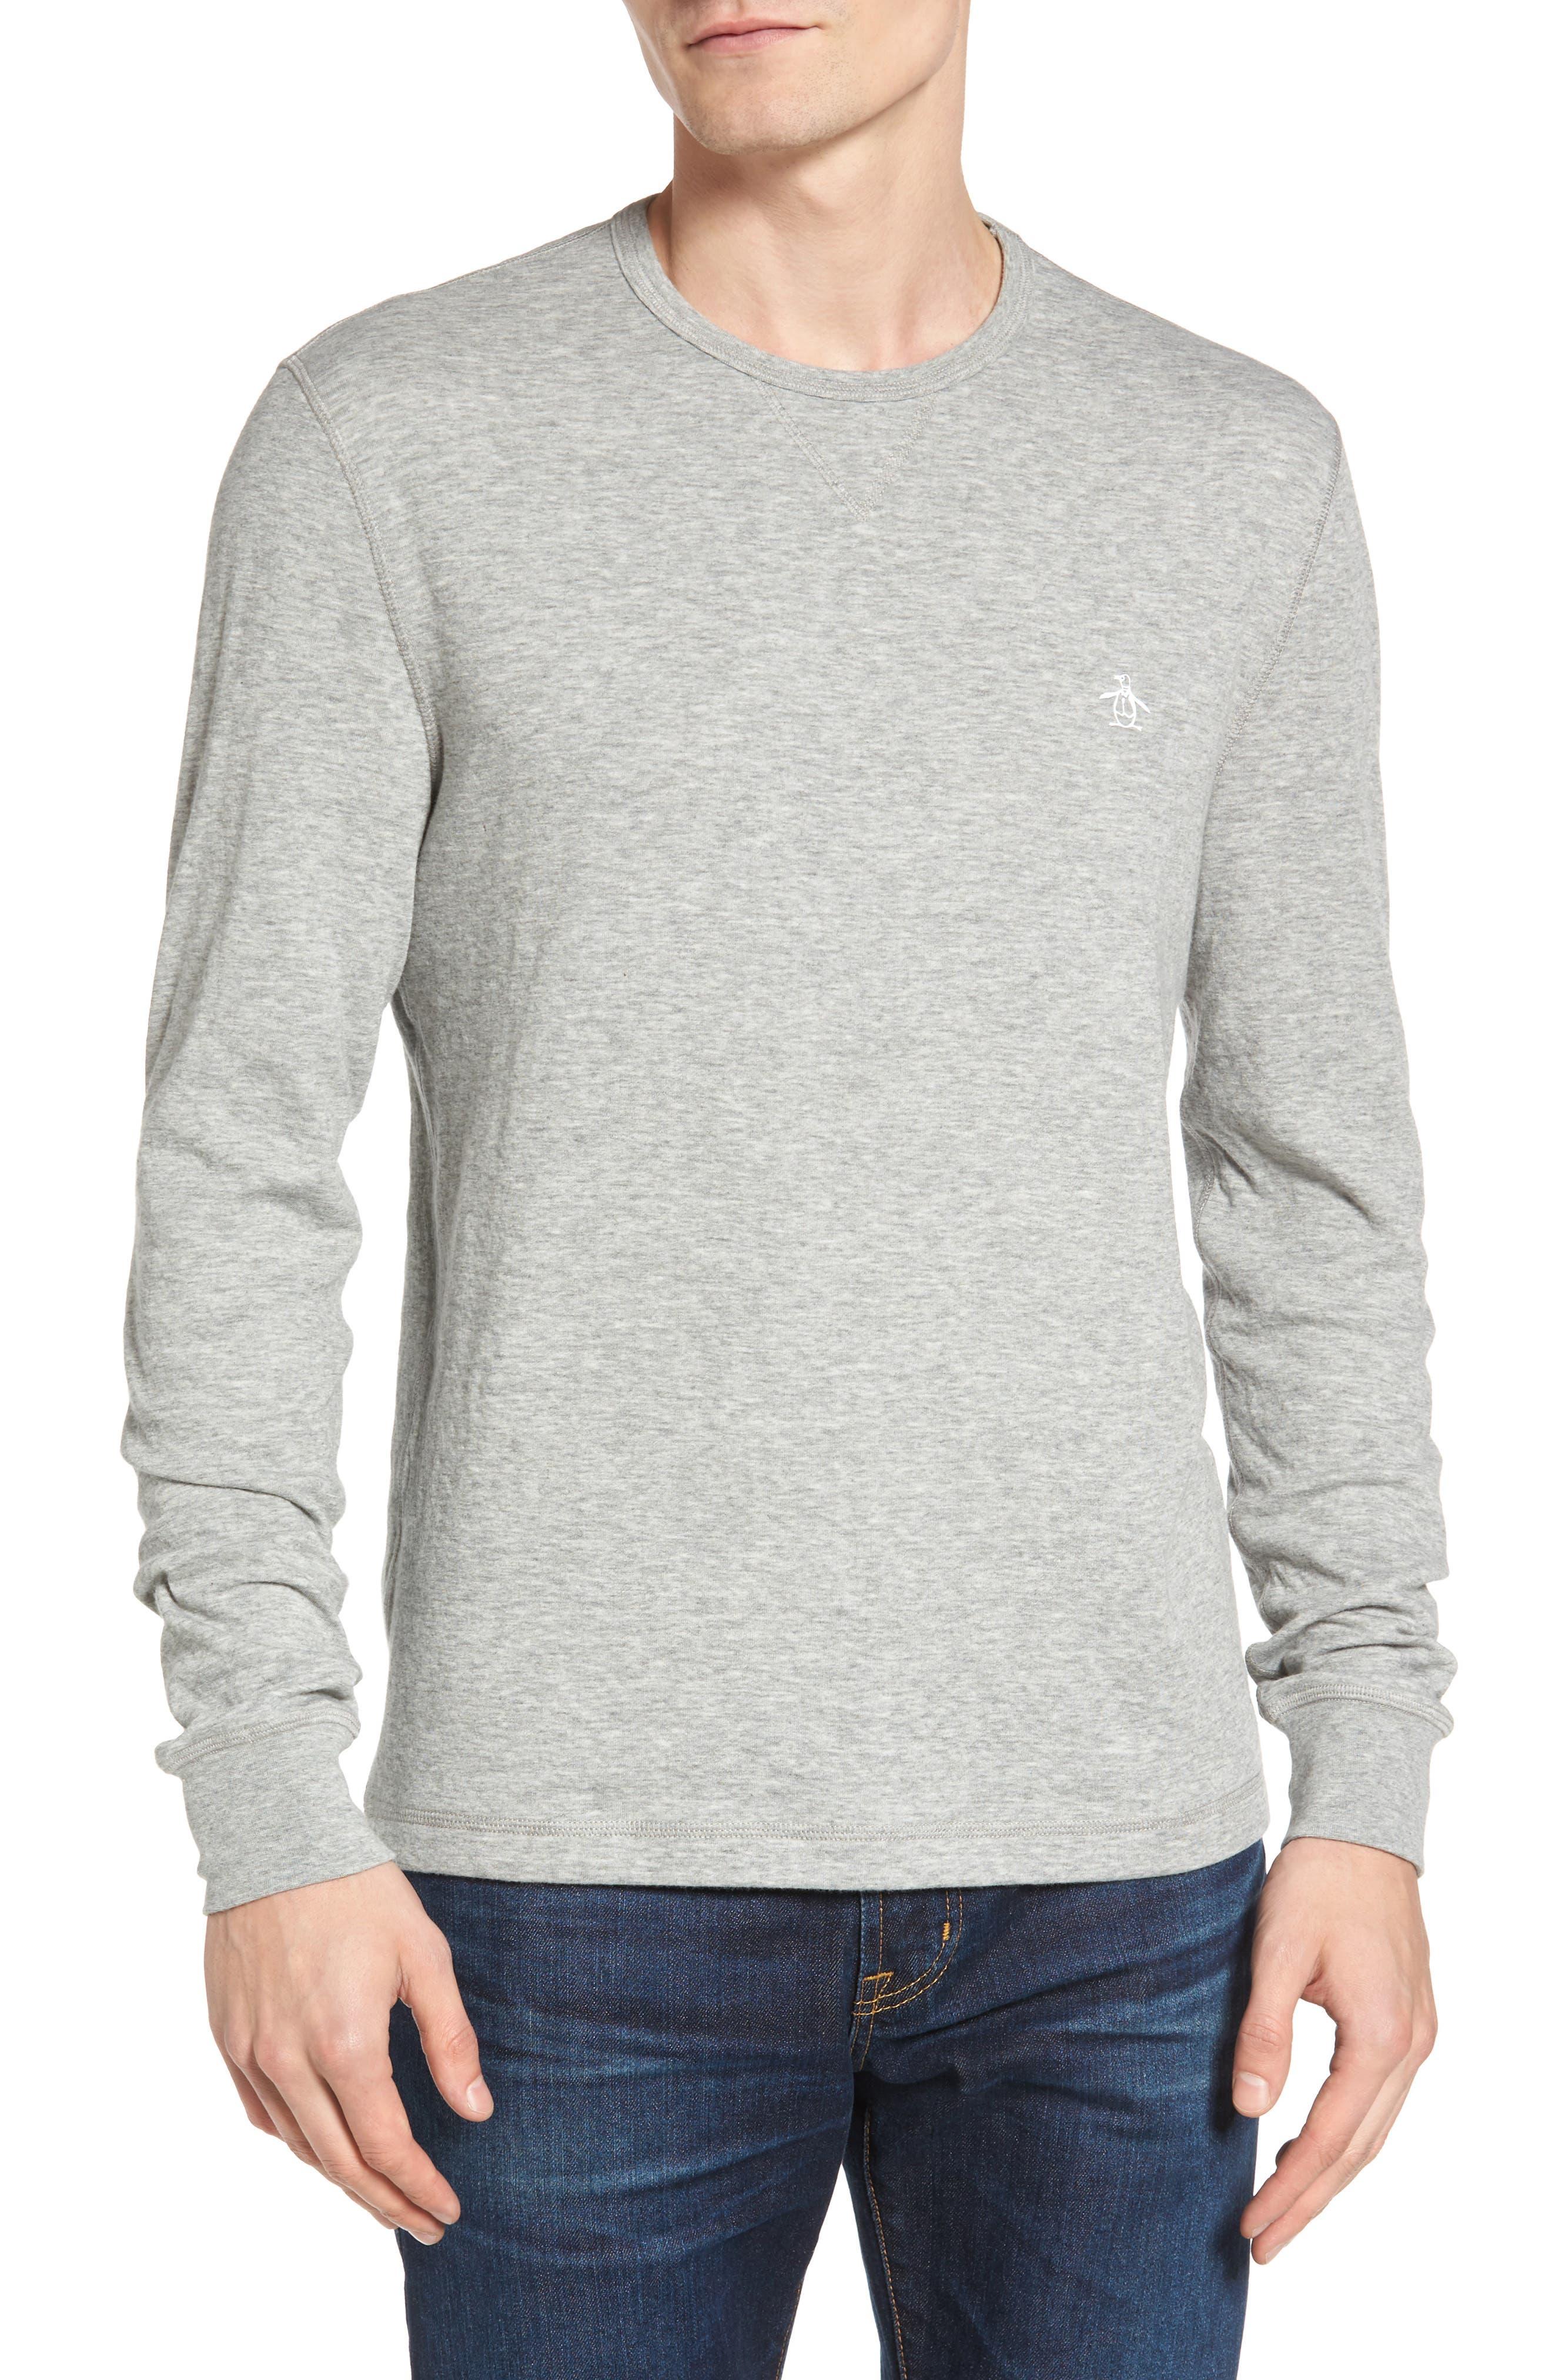 Original Penguin Reversible Long Sleeve T-Shirt